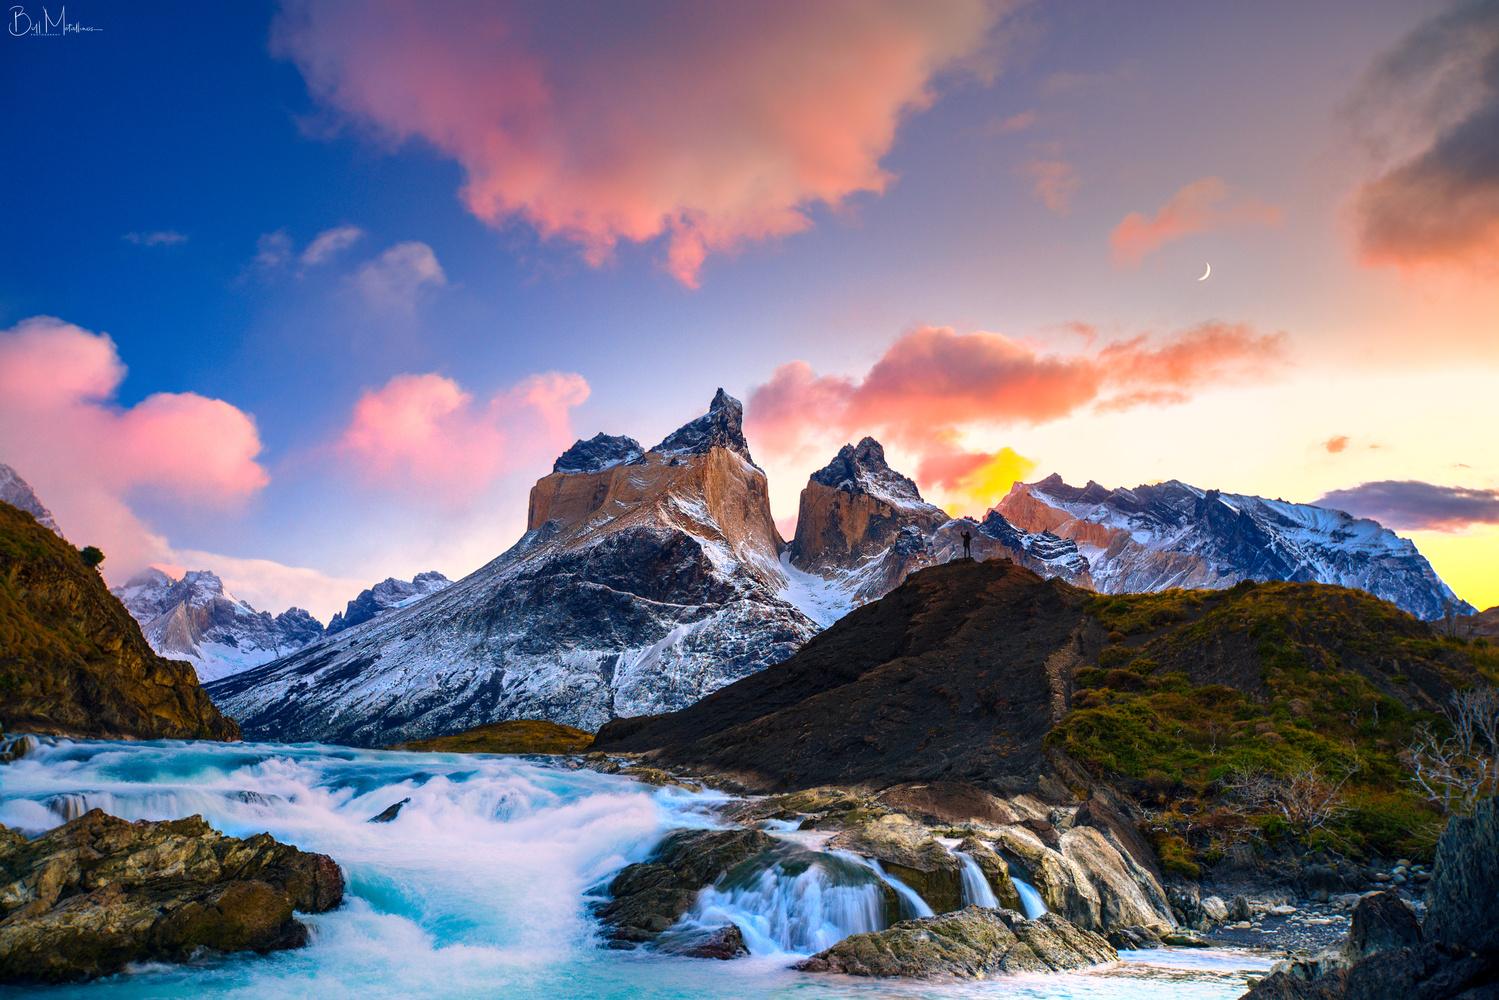 Patagonian Dreams by Bill Metallinos